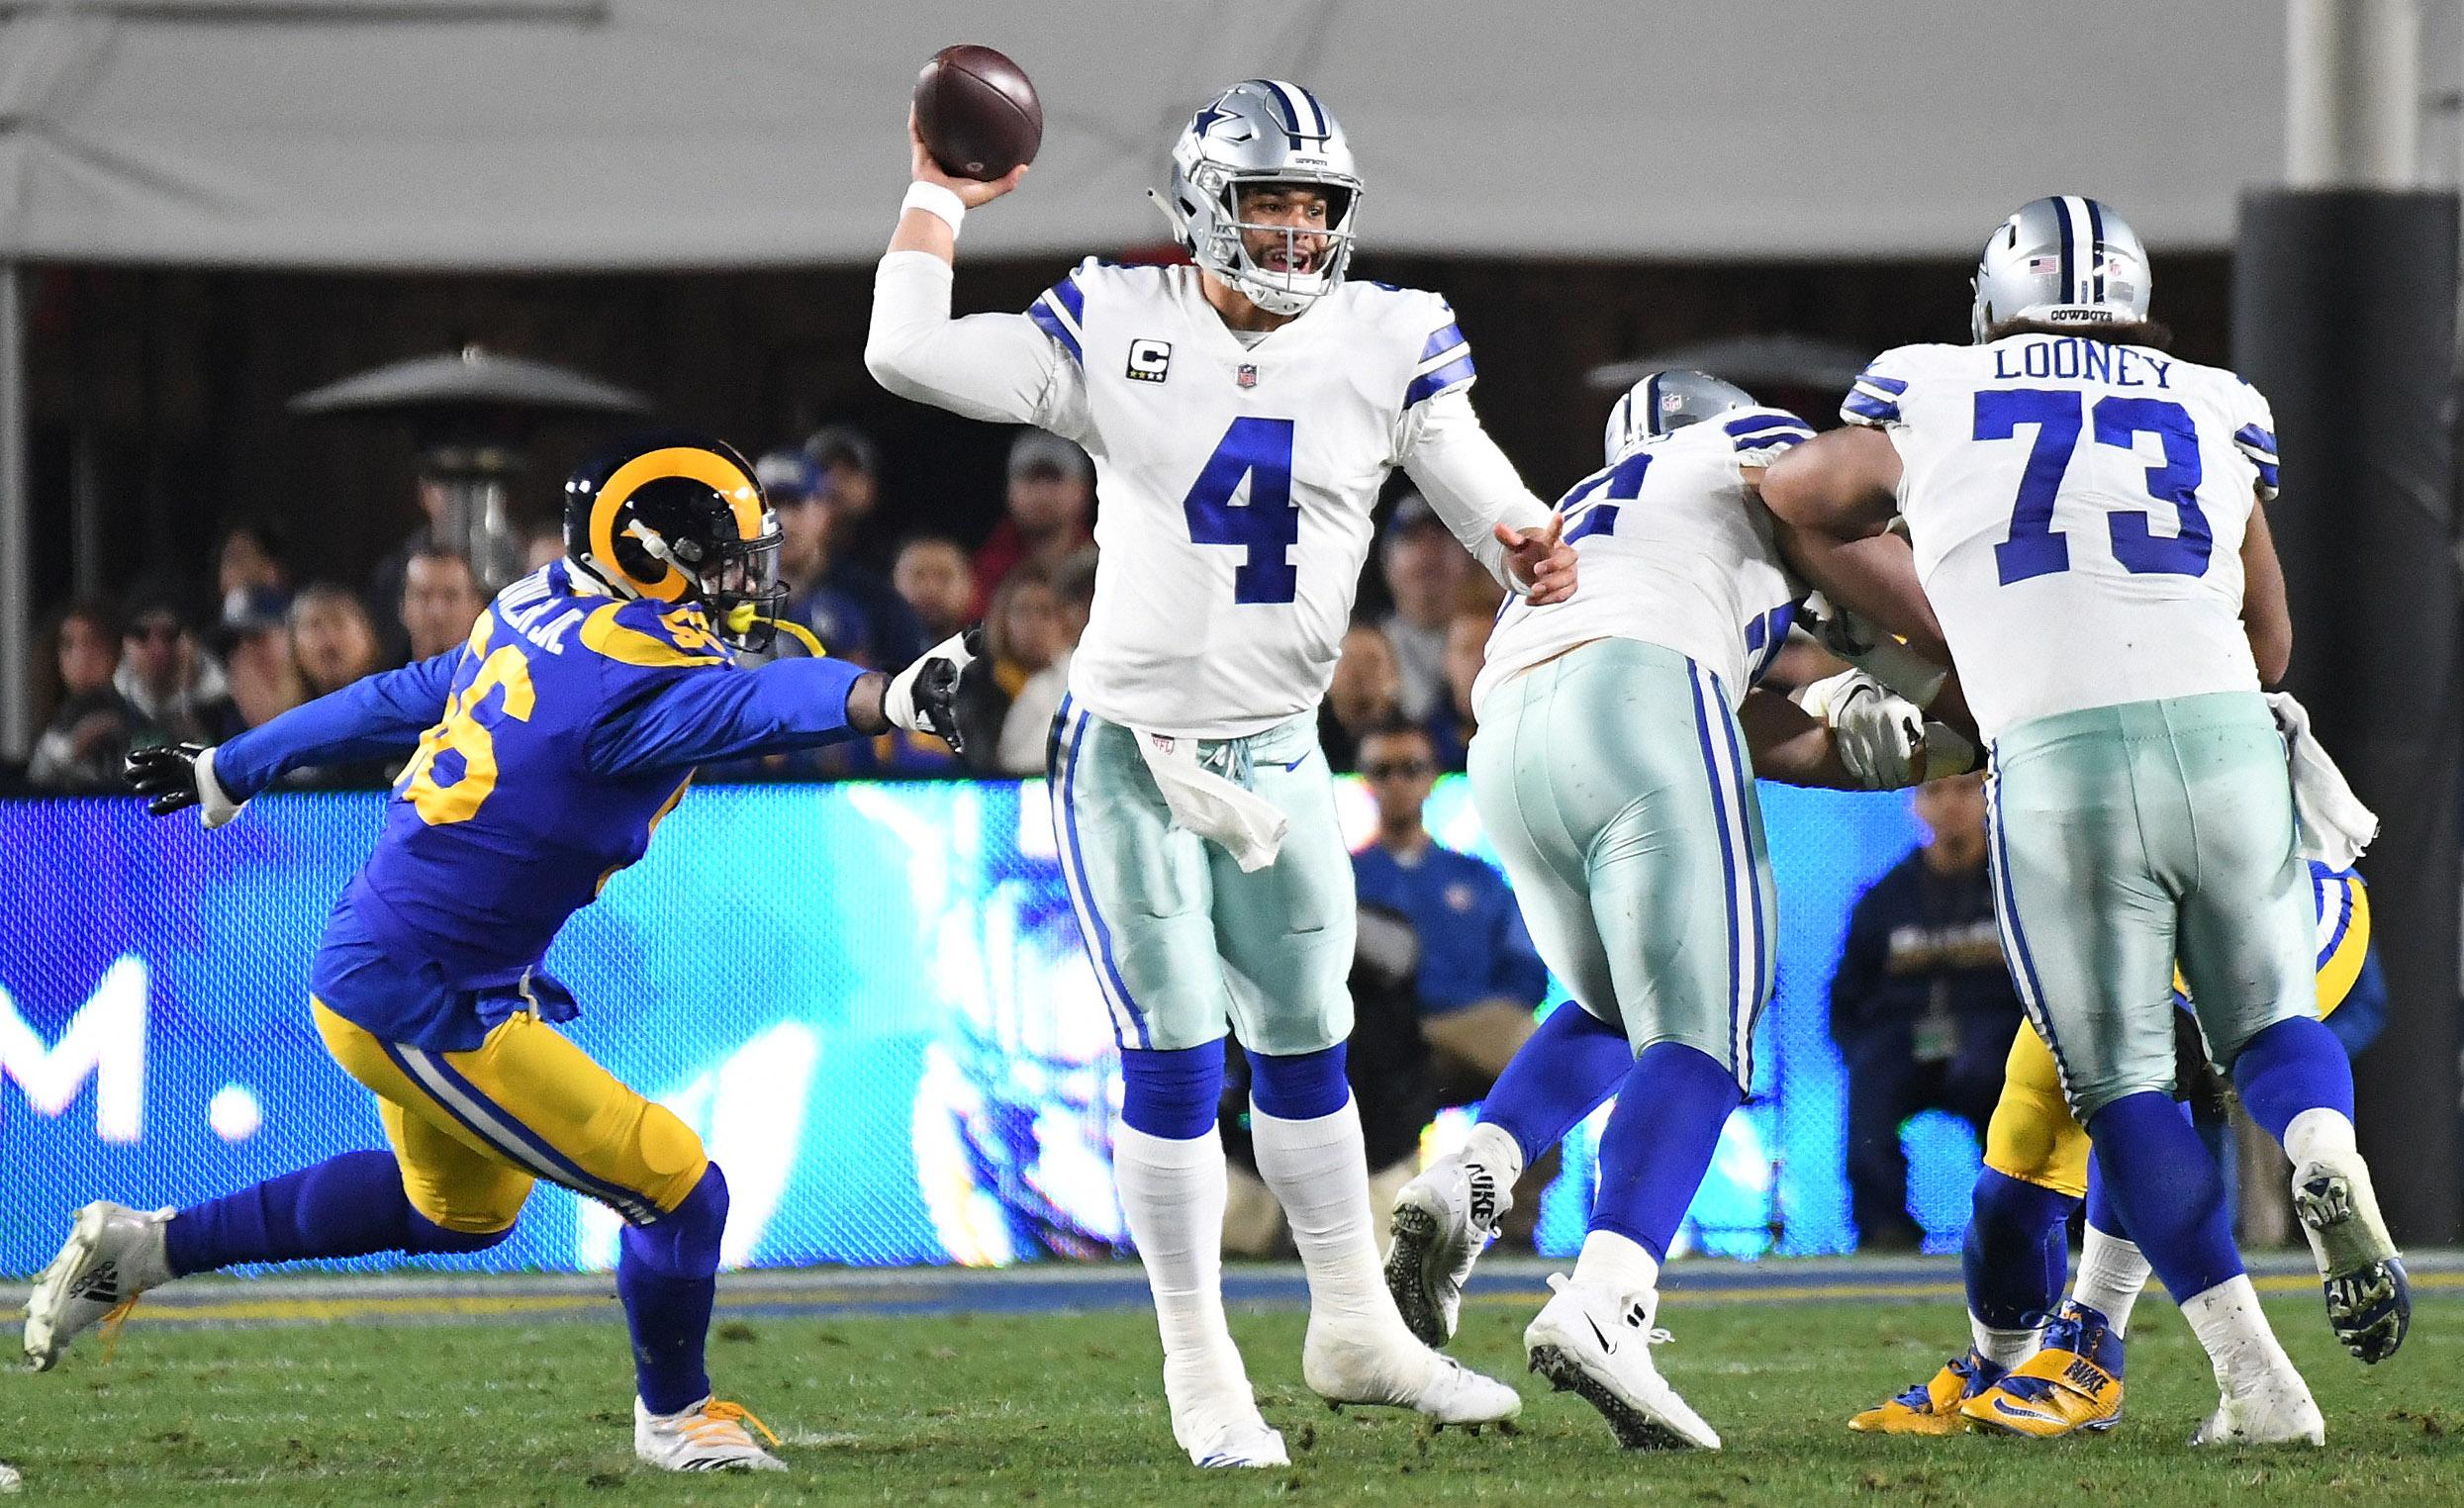 Fantasy Football Draft Kit: 24 Biggest Busts For 2019-20 NFL